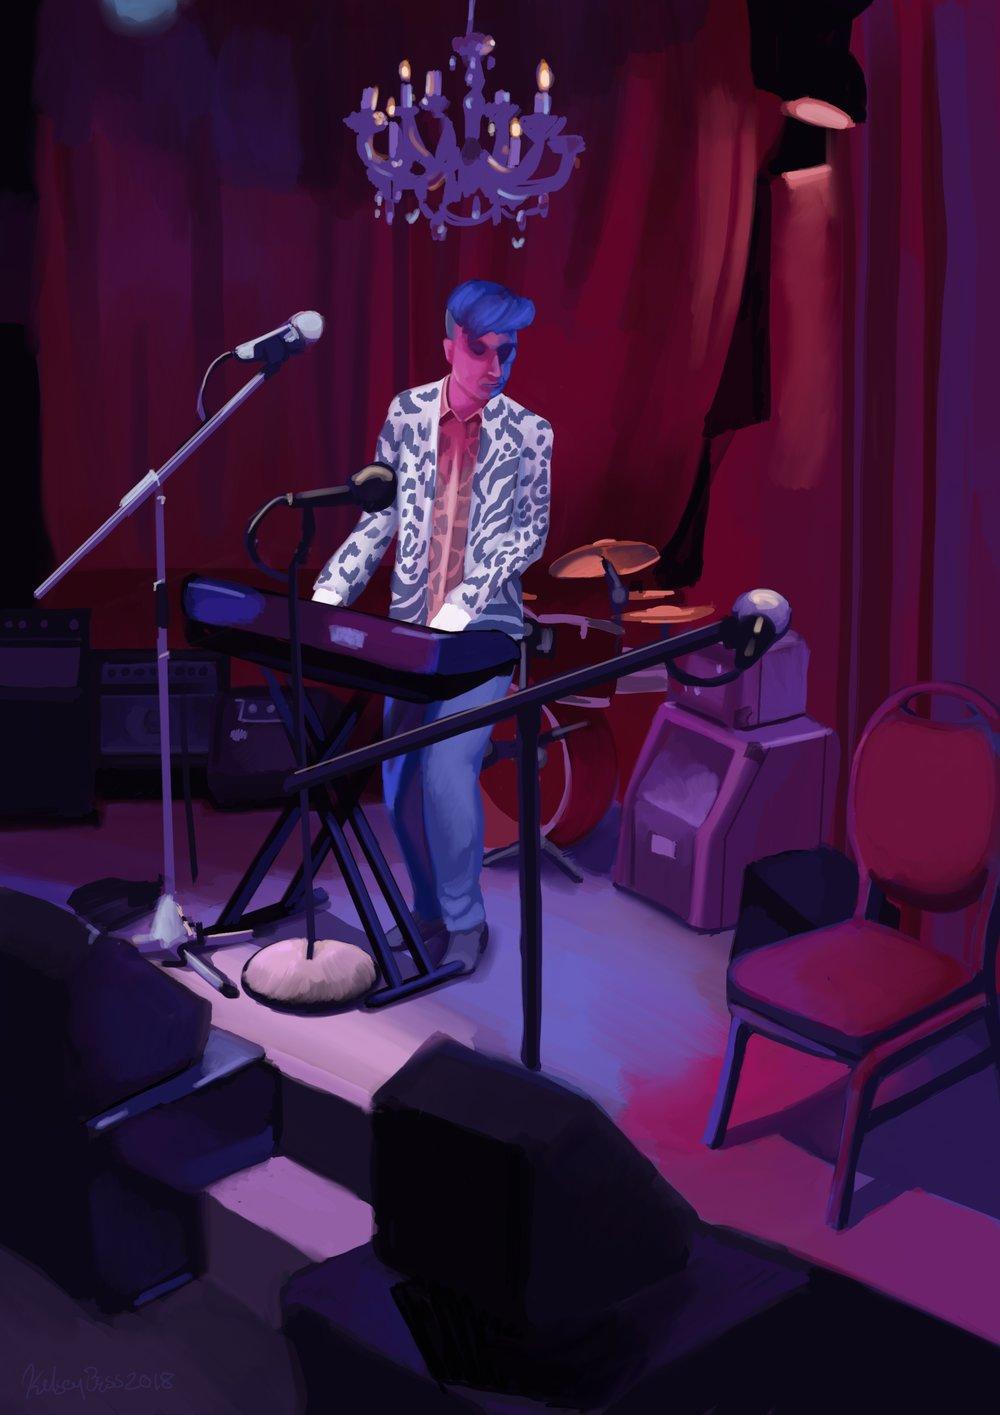 Tom_Petty_Concert4.jpg